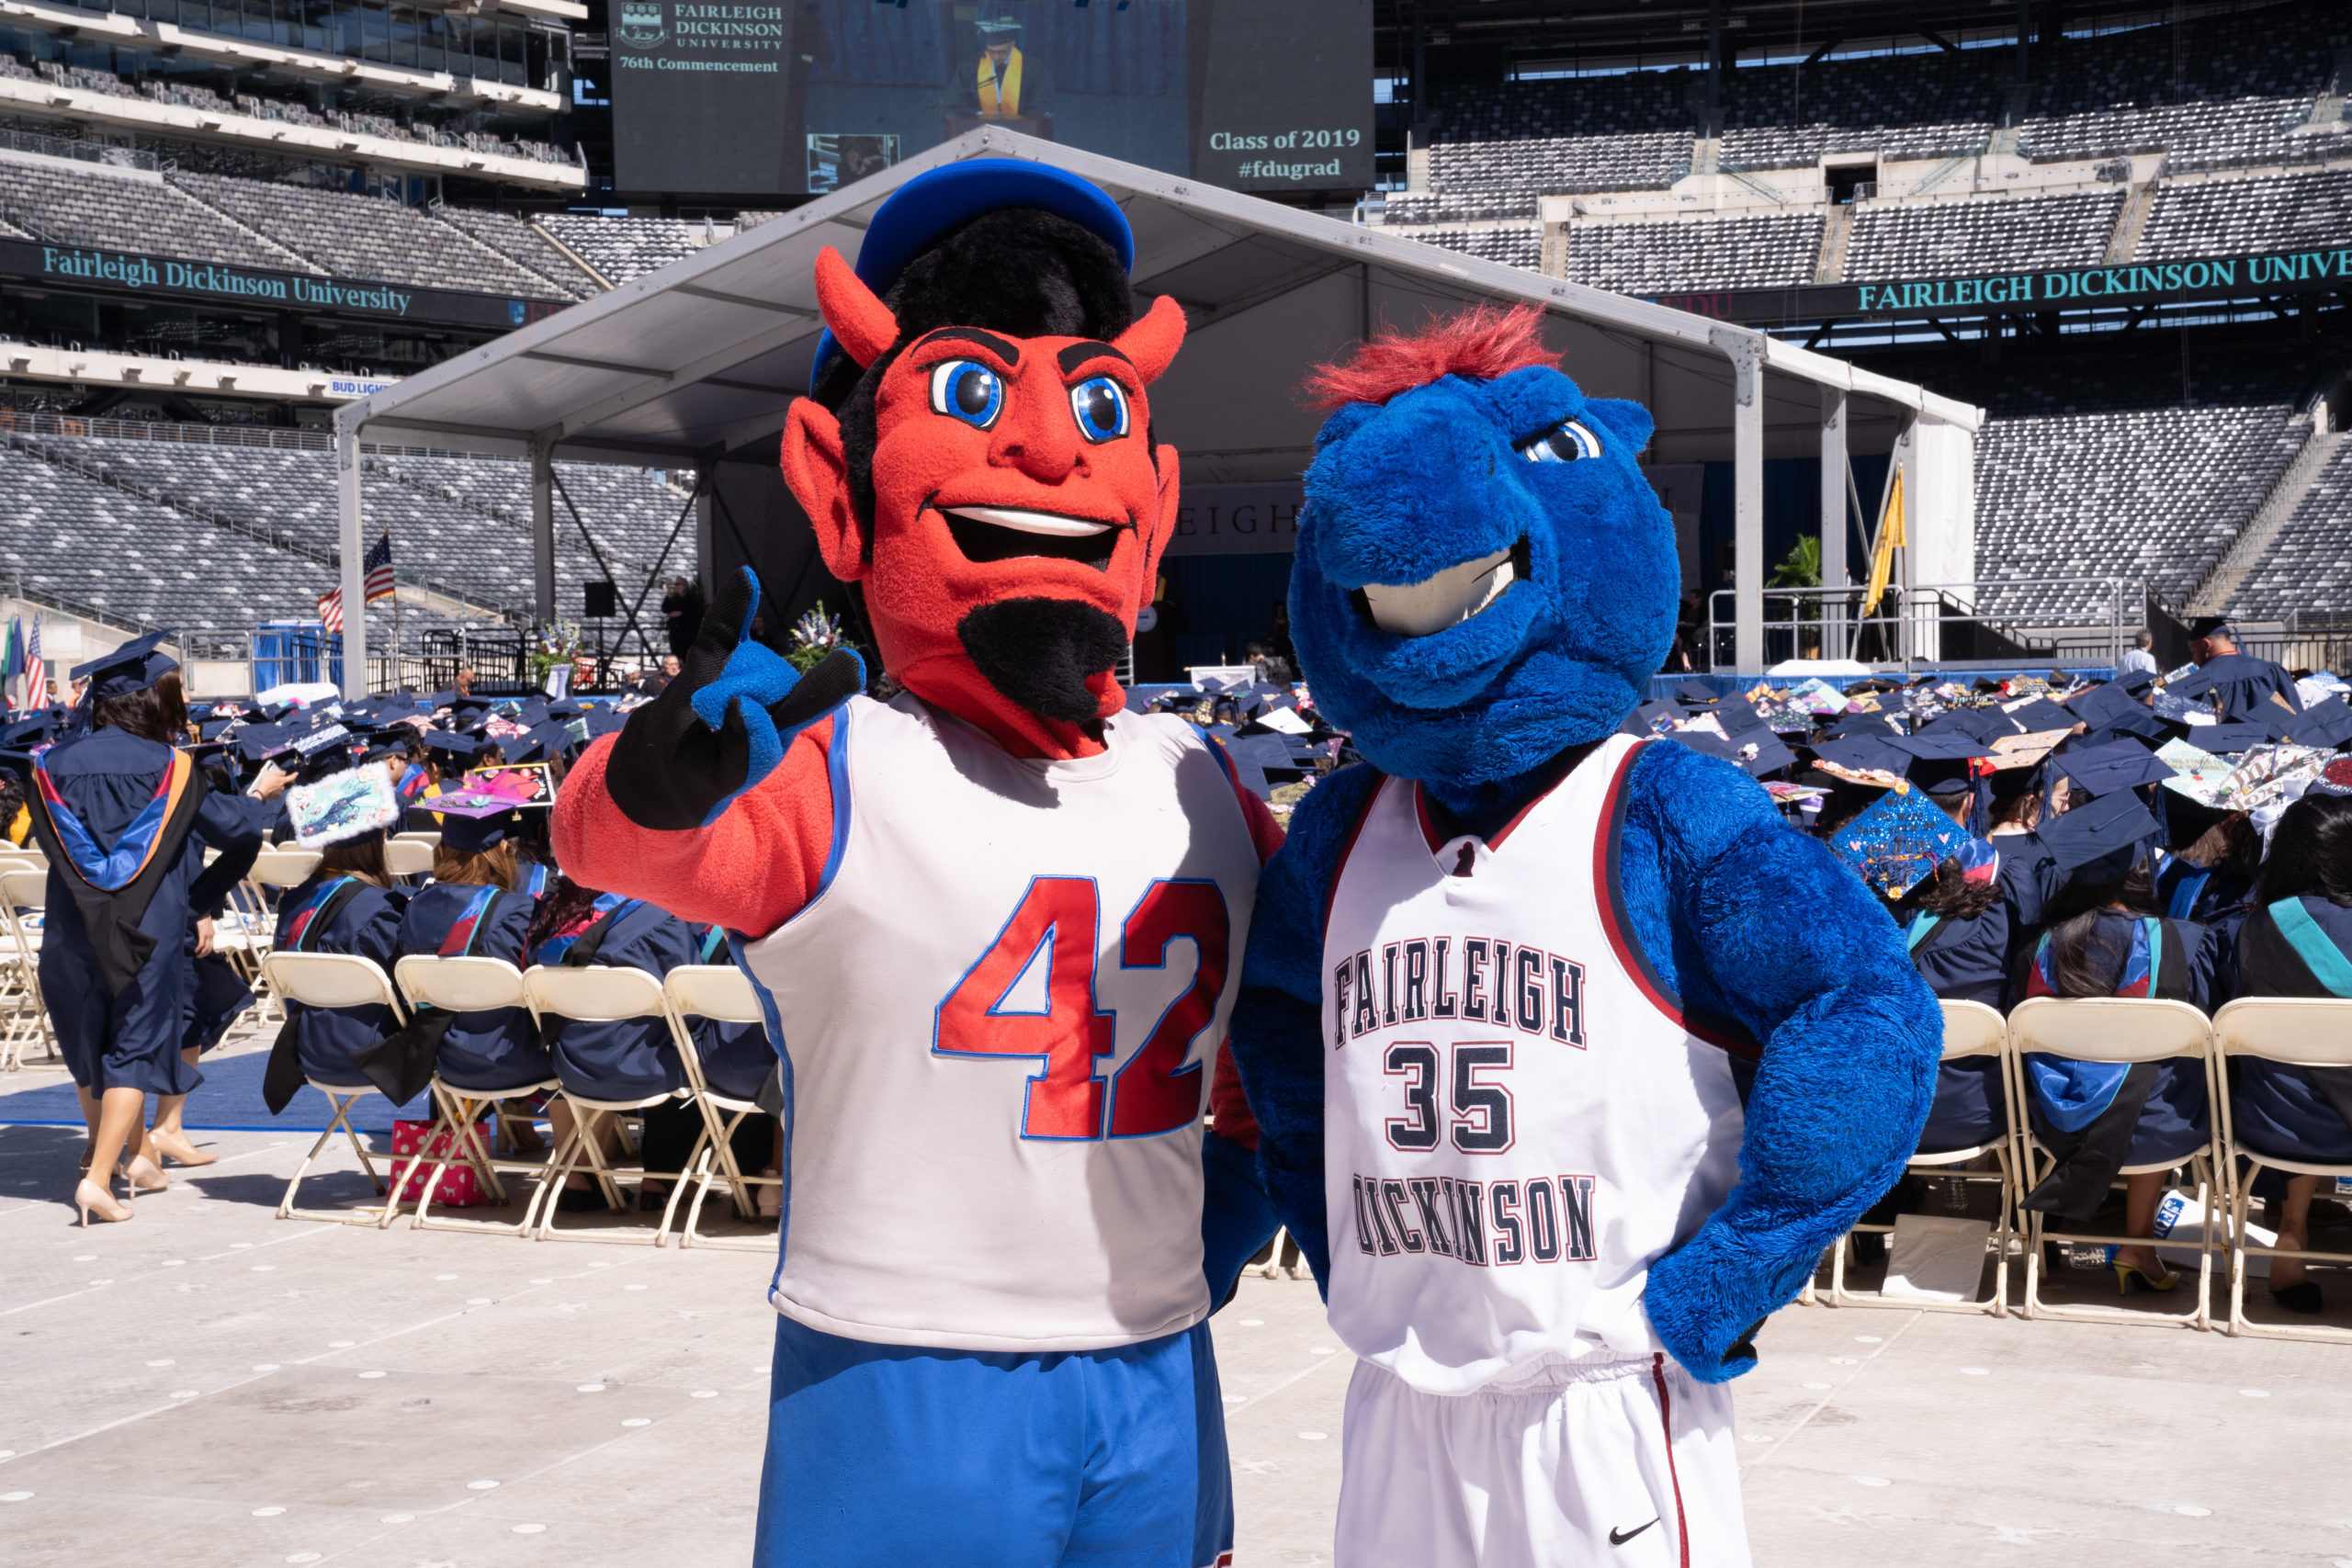 FDU mascots Ian the Devil and Knightro pose for a photo